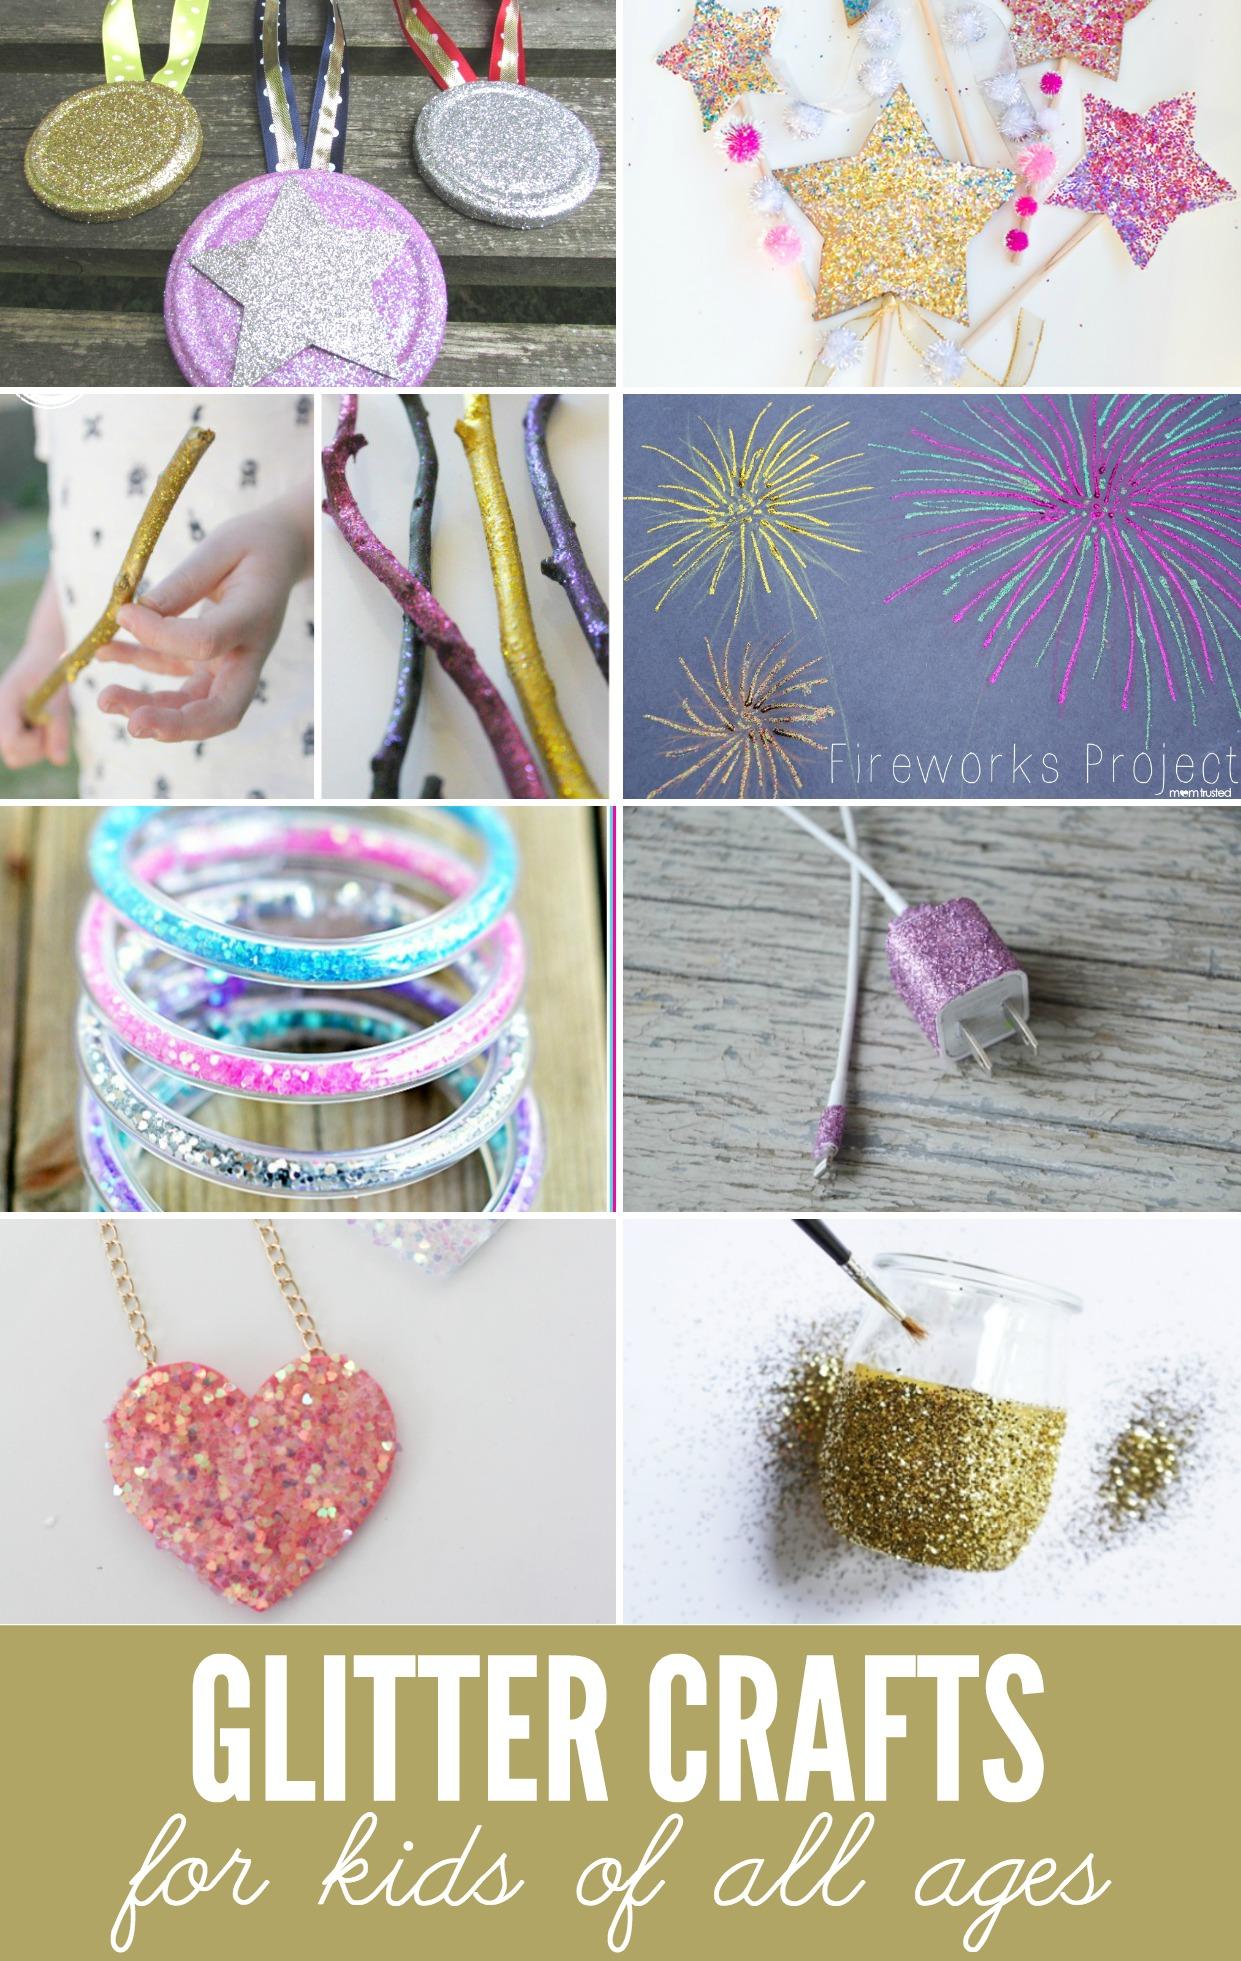 Glitter Crafts for Kids